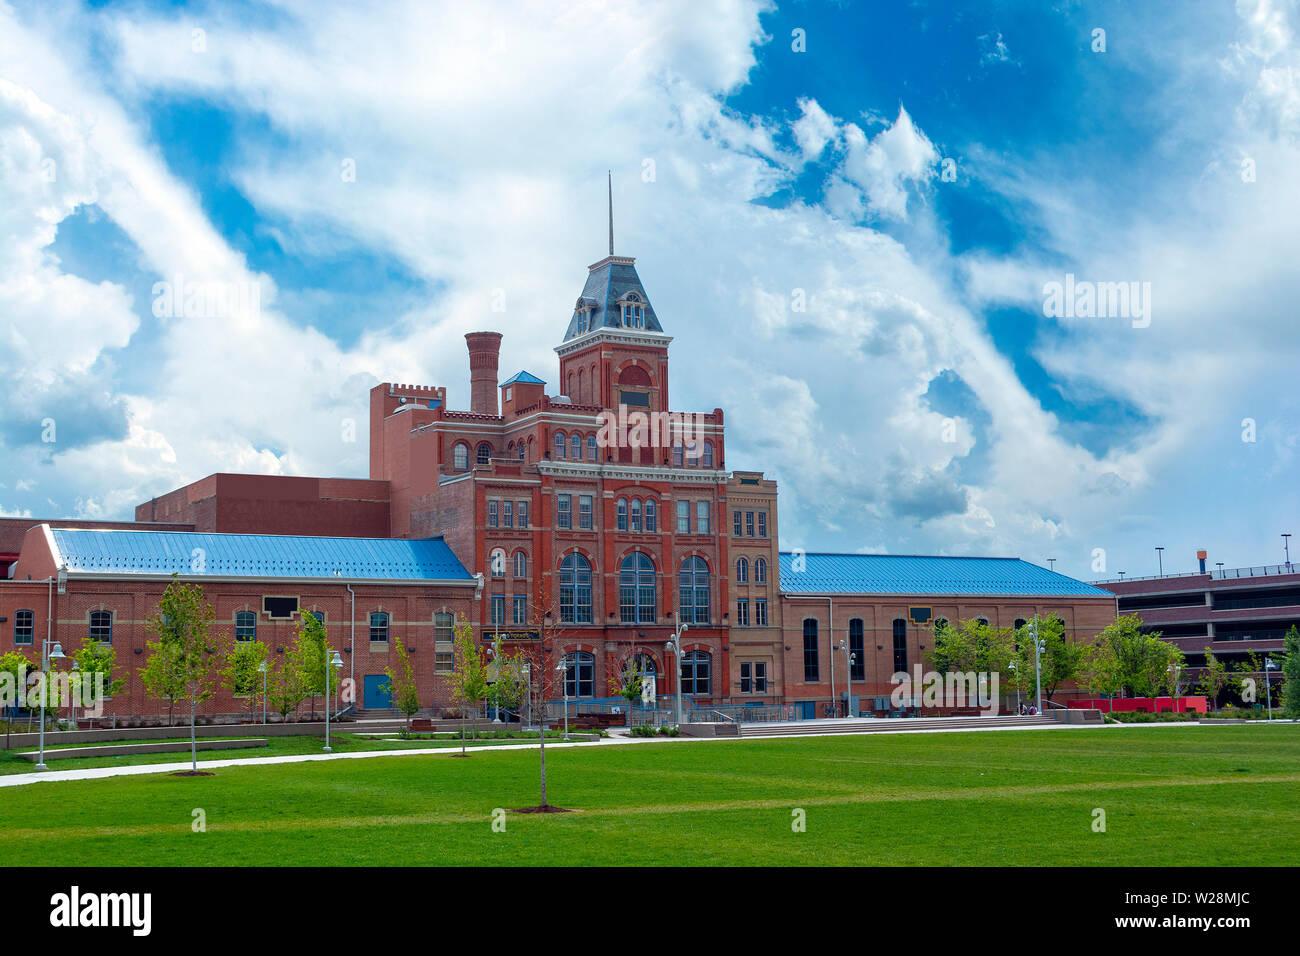 Colleges In Denver Colorado >> University Of Colorado Denver Community College Of Denver And